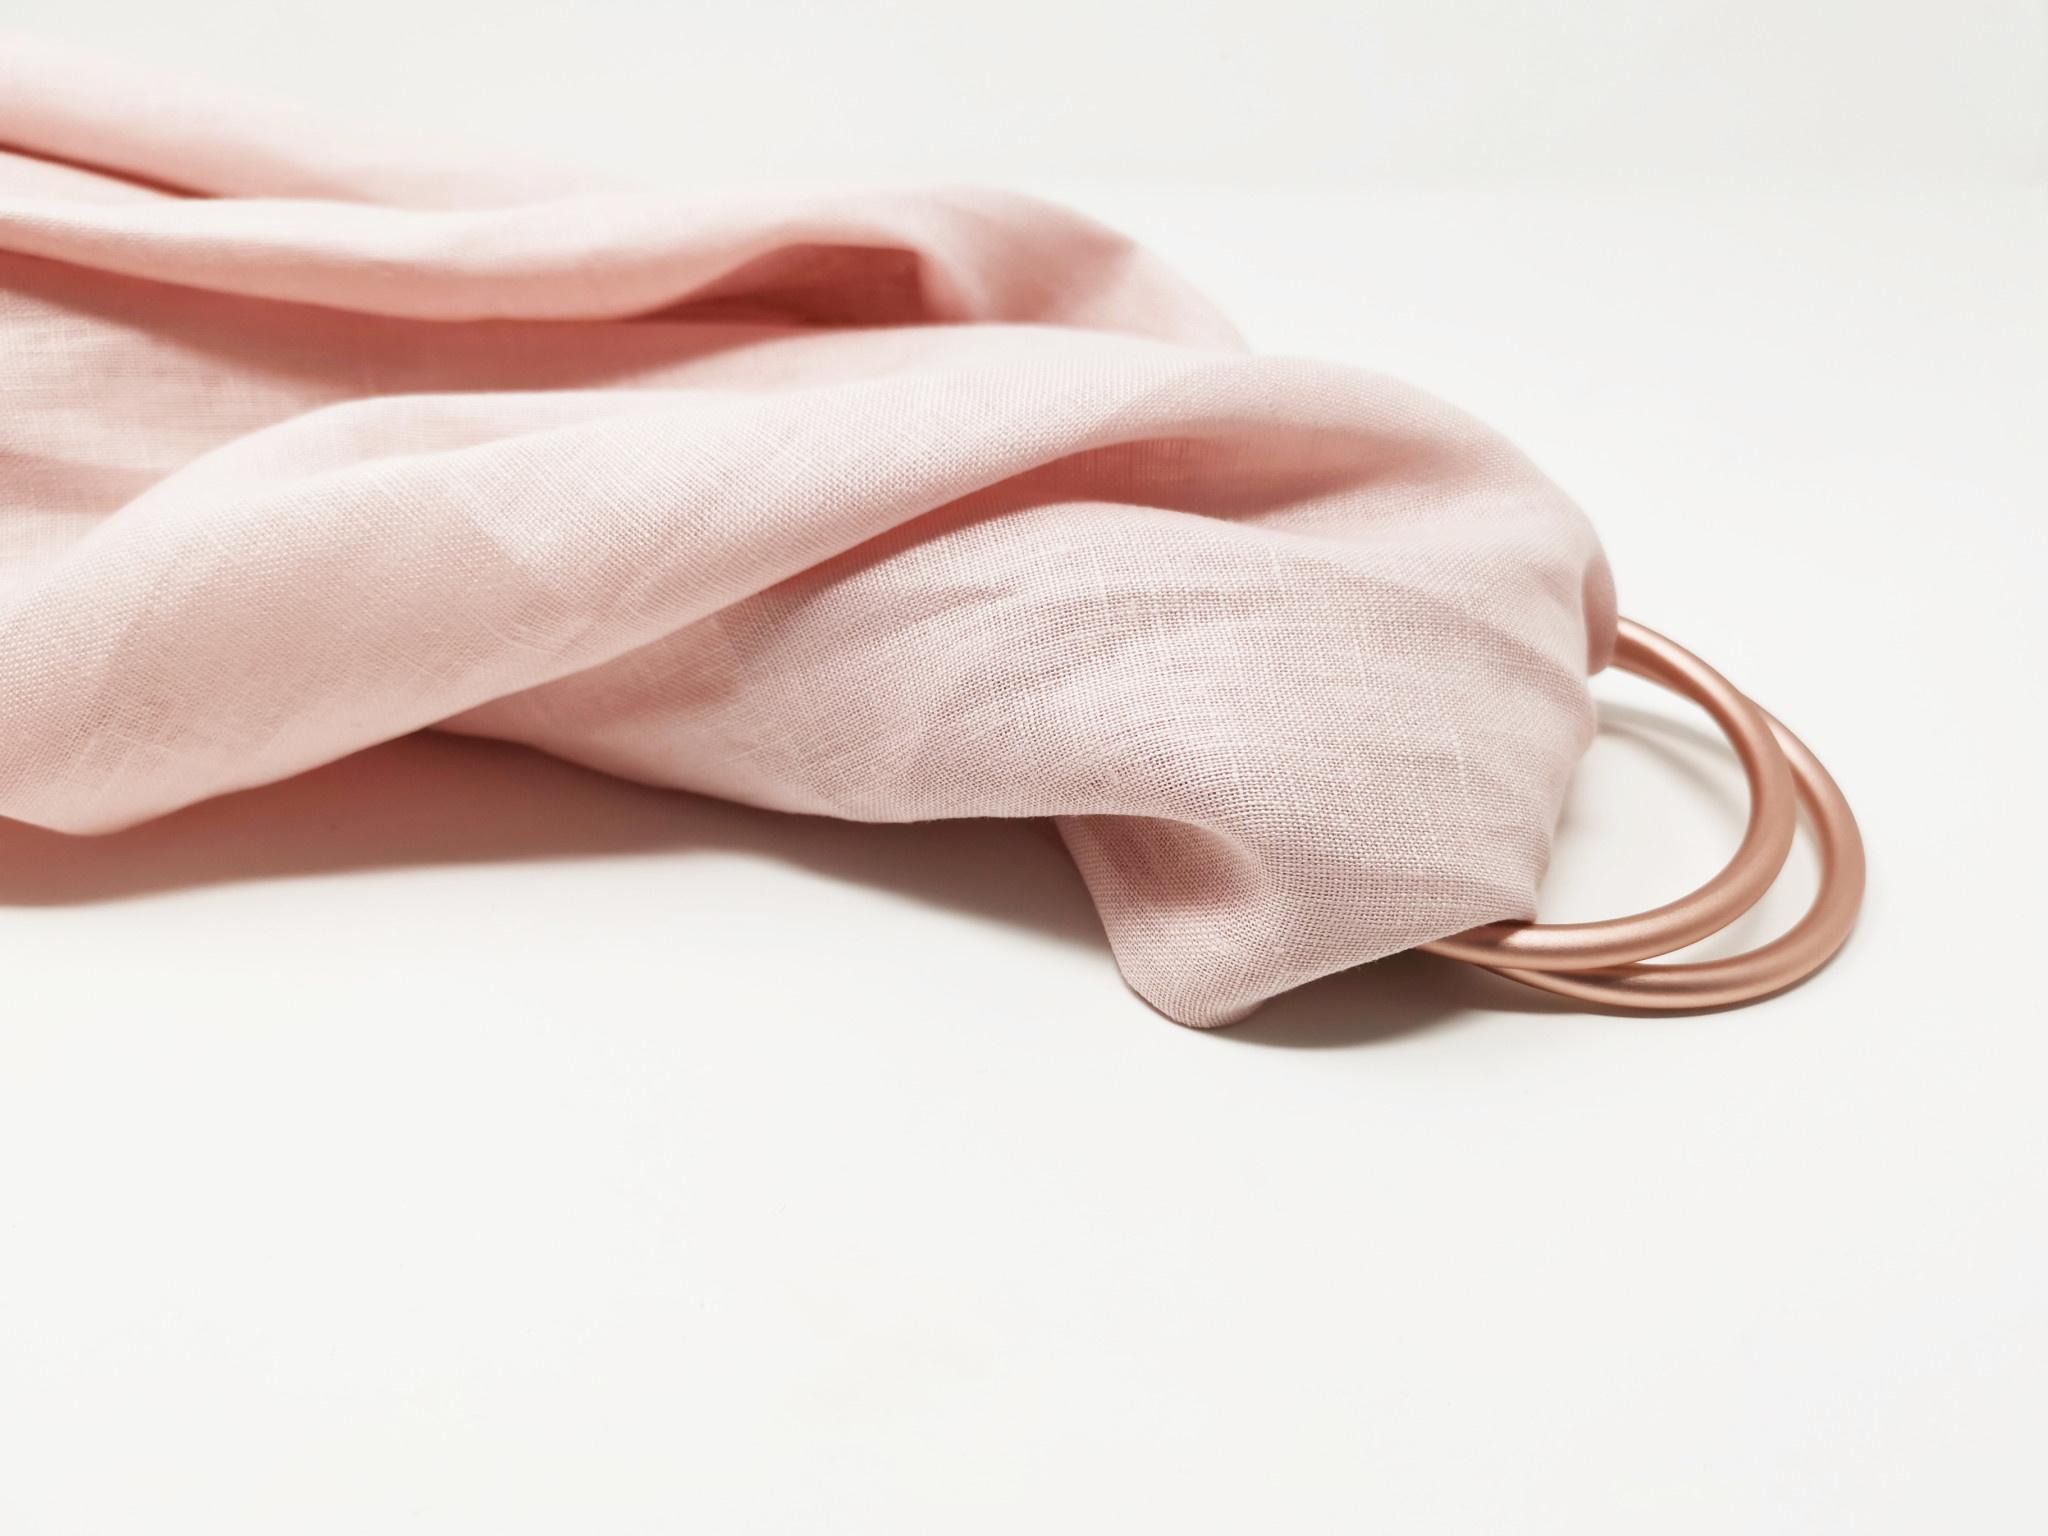 enlee Organic Ring Sling Baby Carrier, Rose